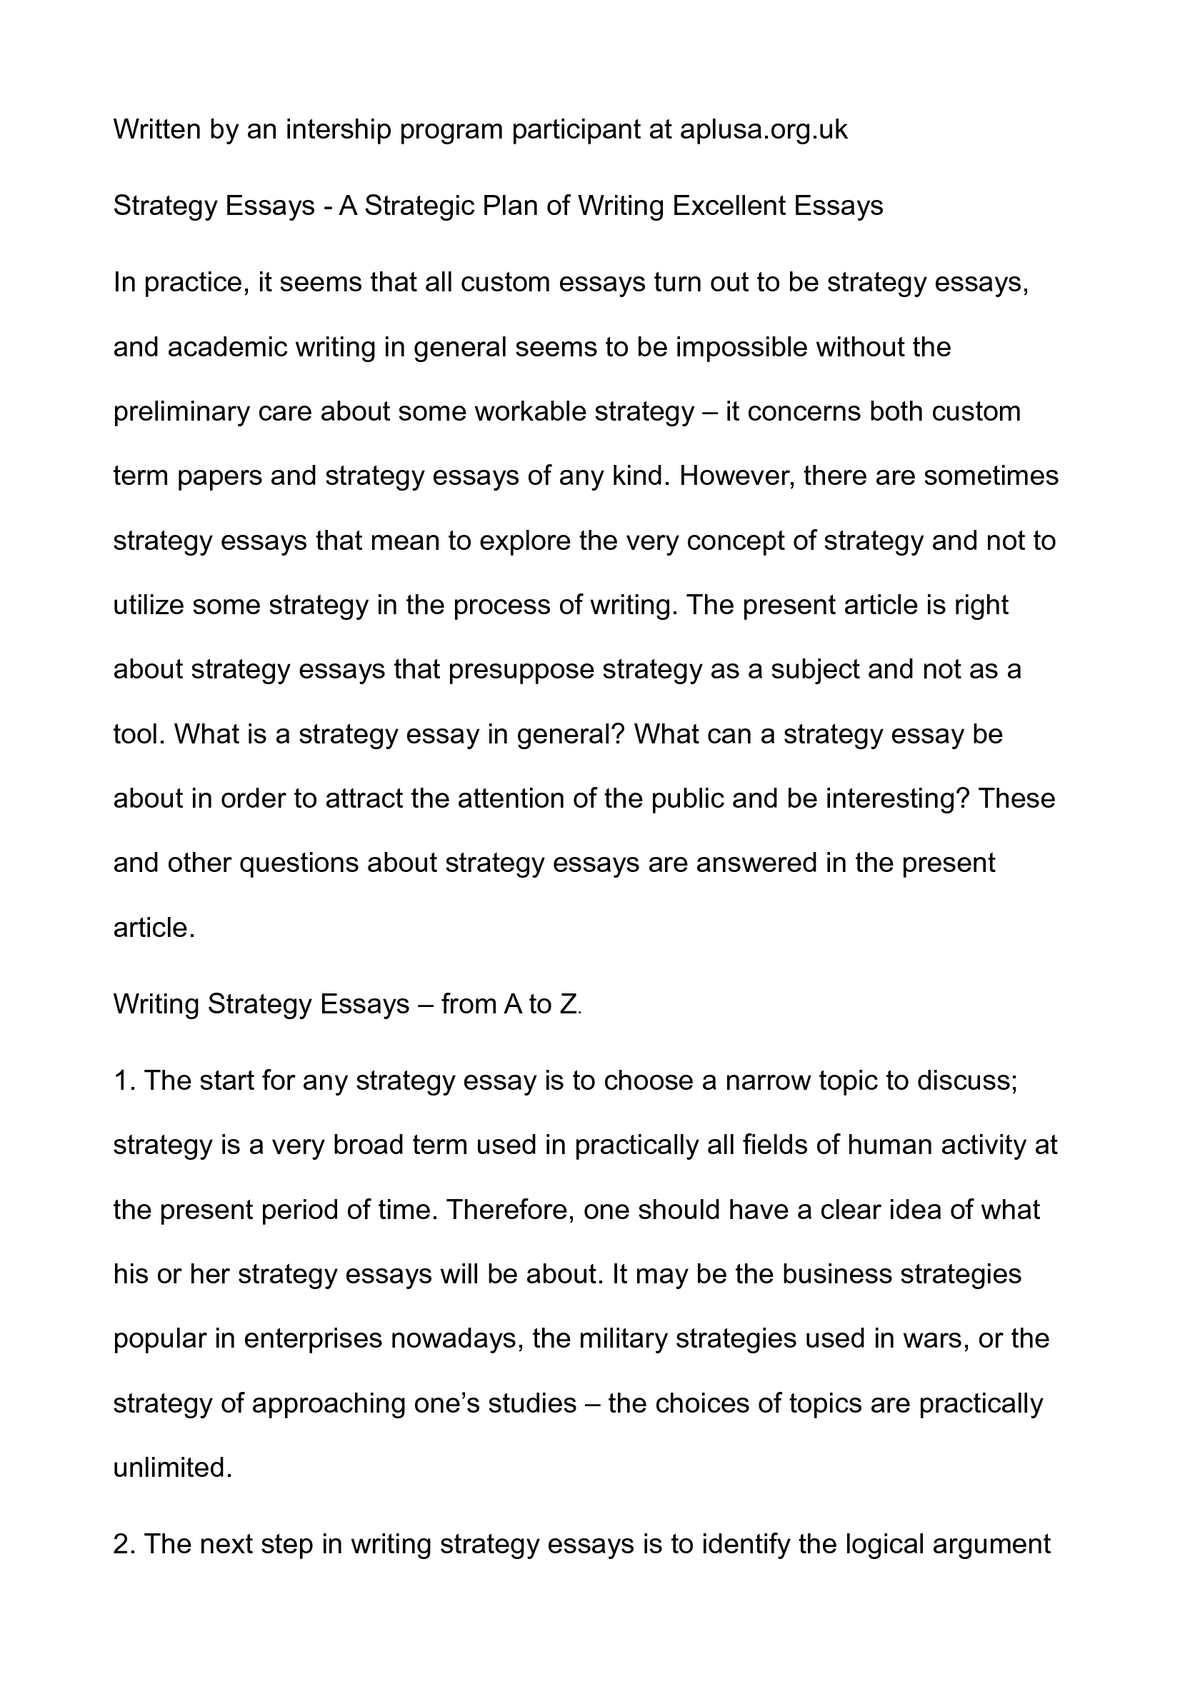 Planning strategies essay writing bell canto critical essay ann patchett